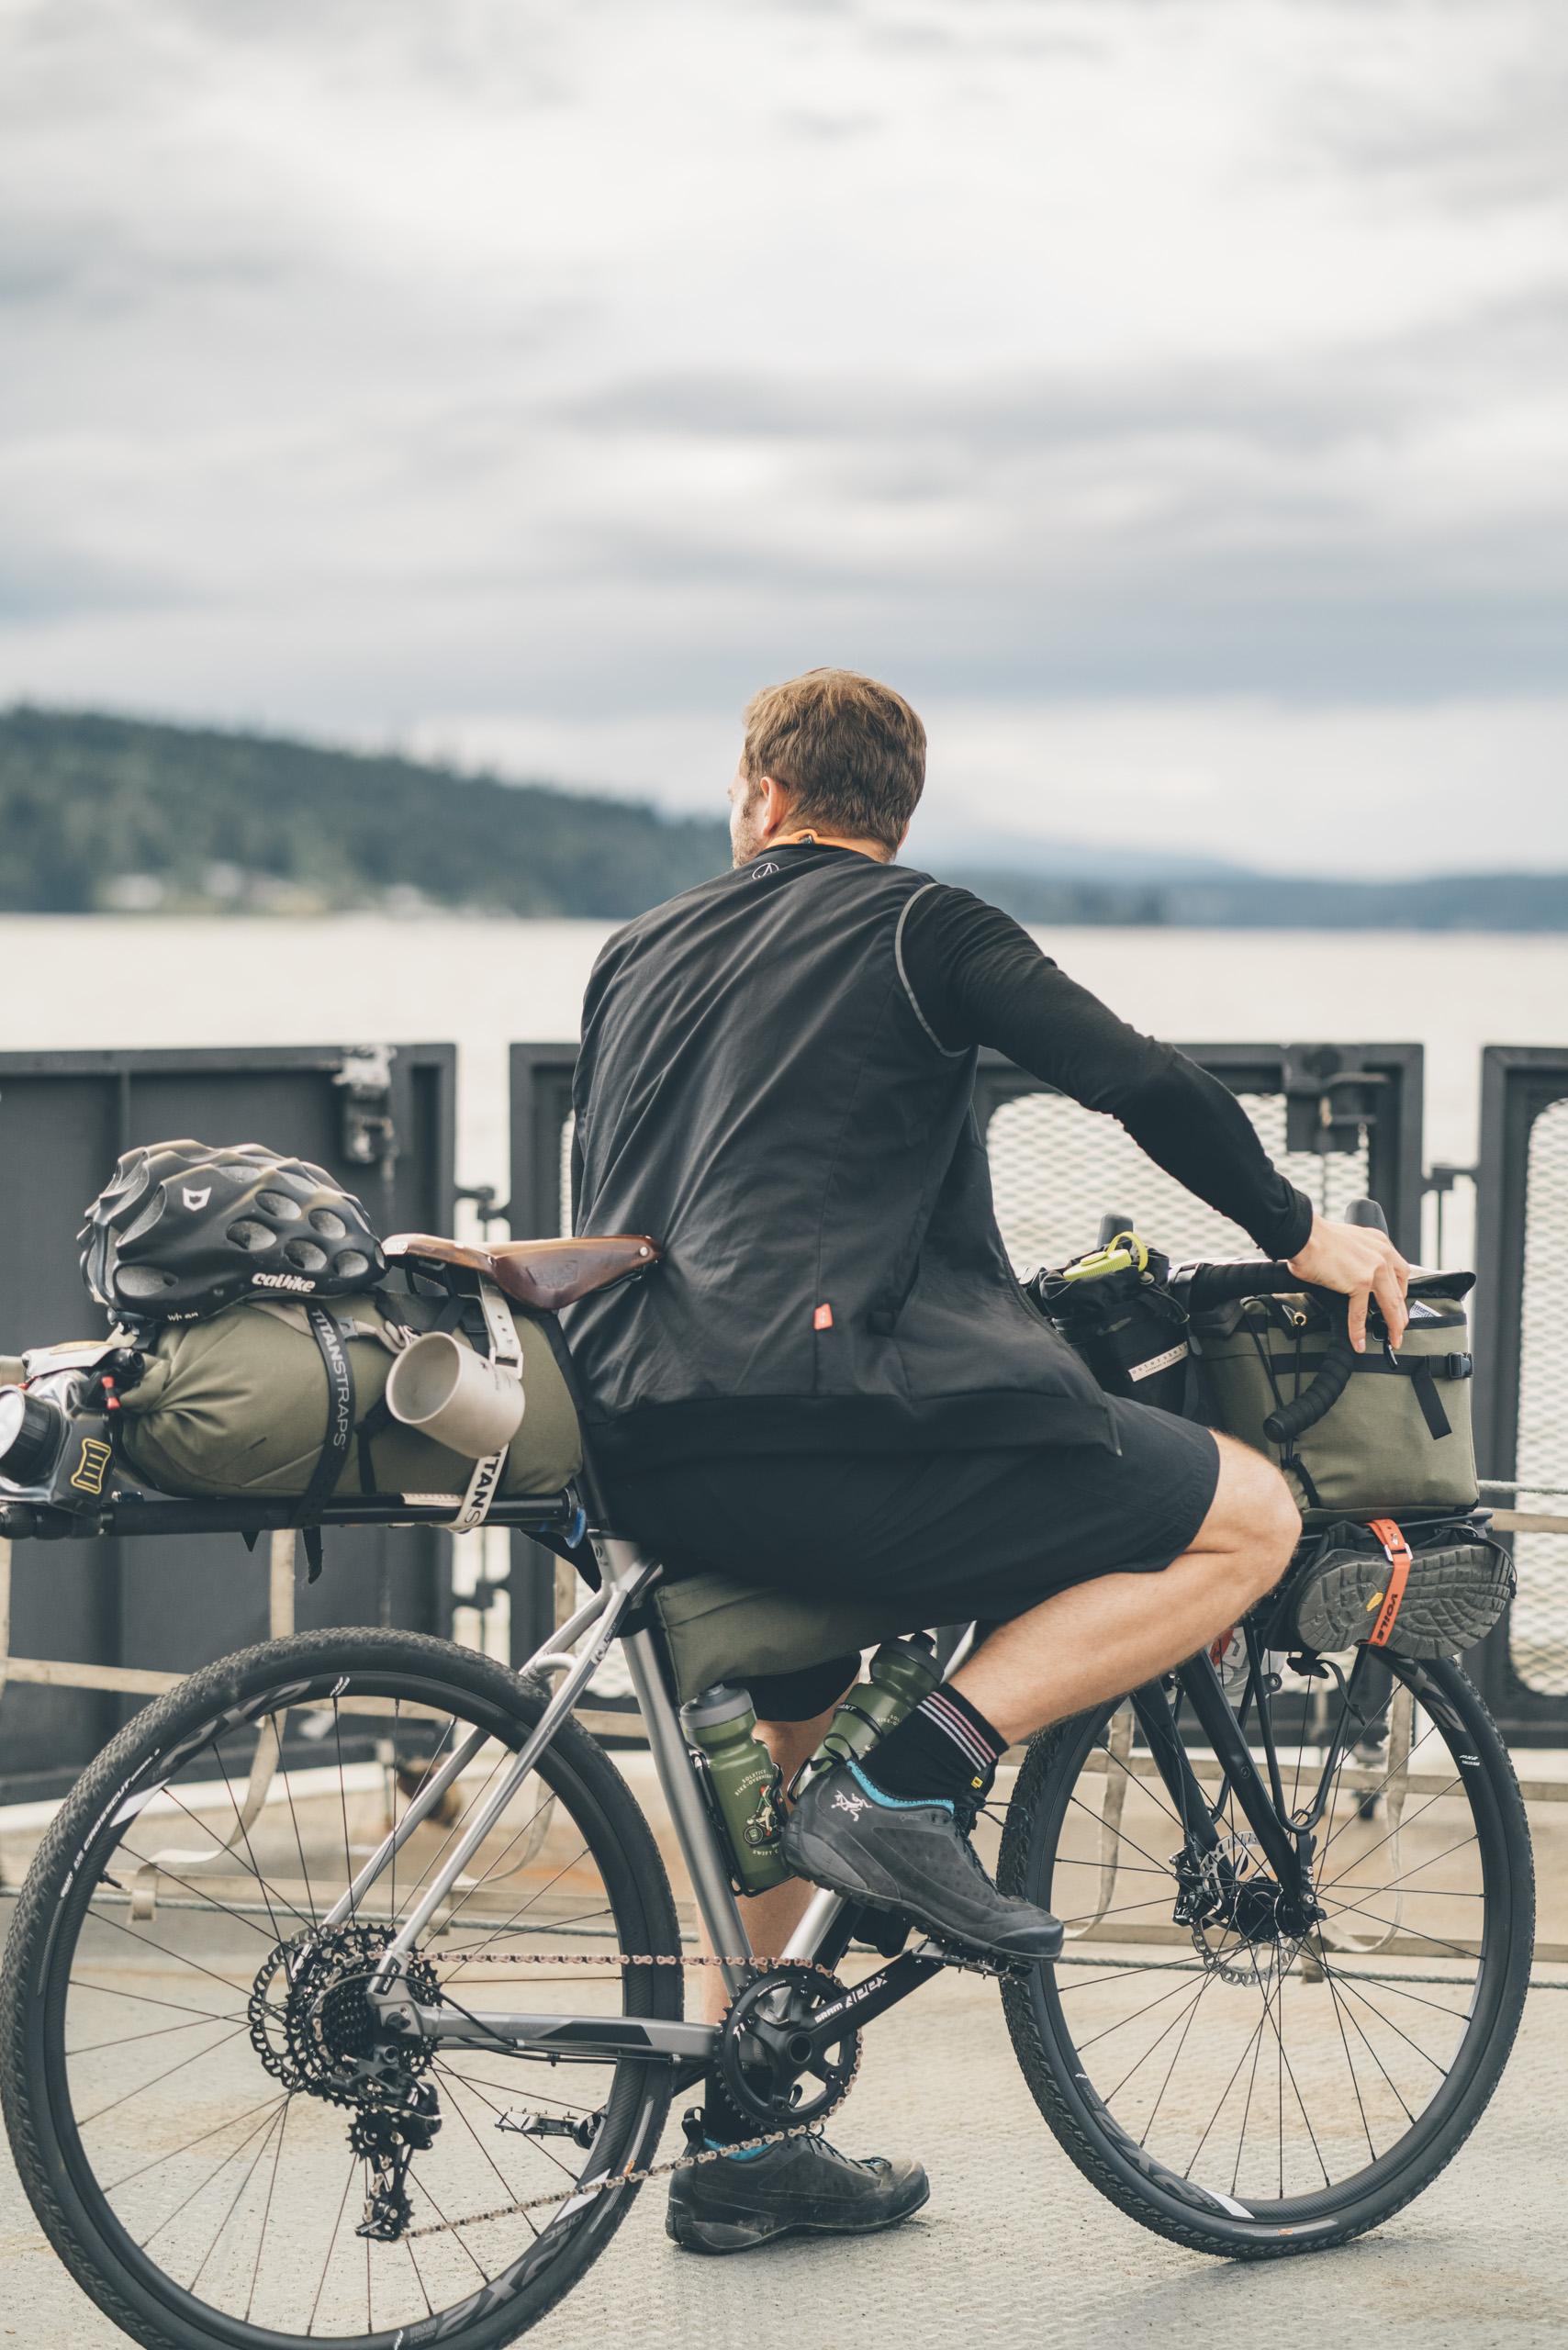 Bikepacking-VanIsland-JohnsonStudios-201806-22.jpg